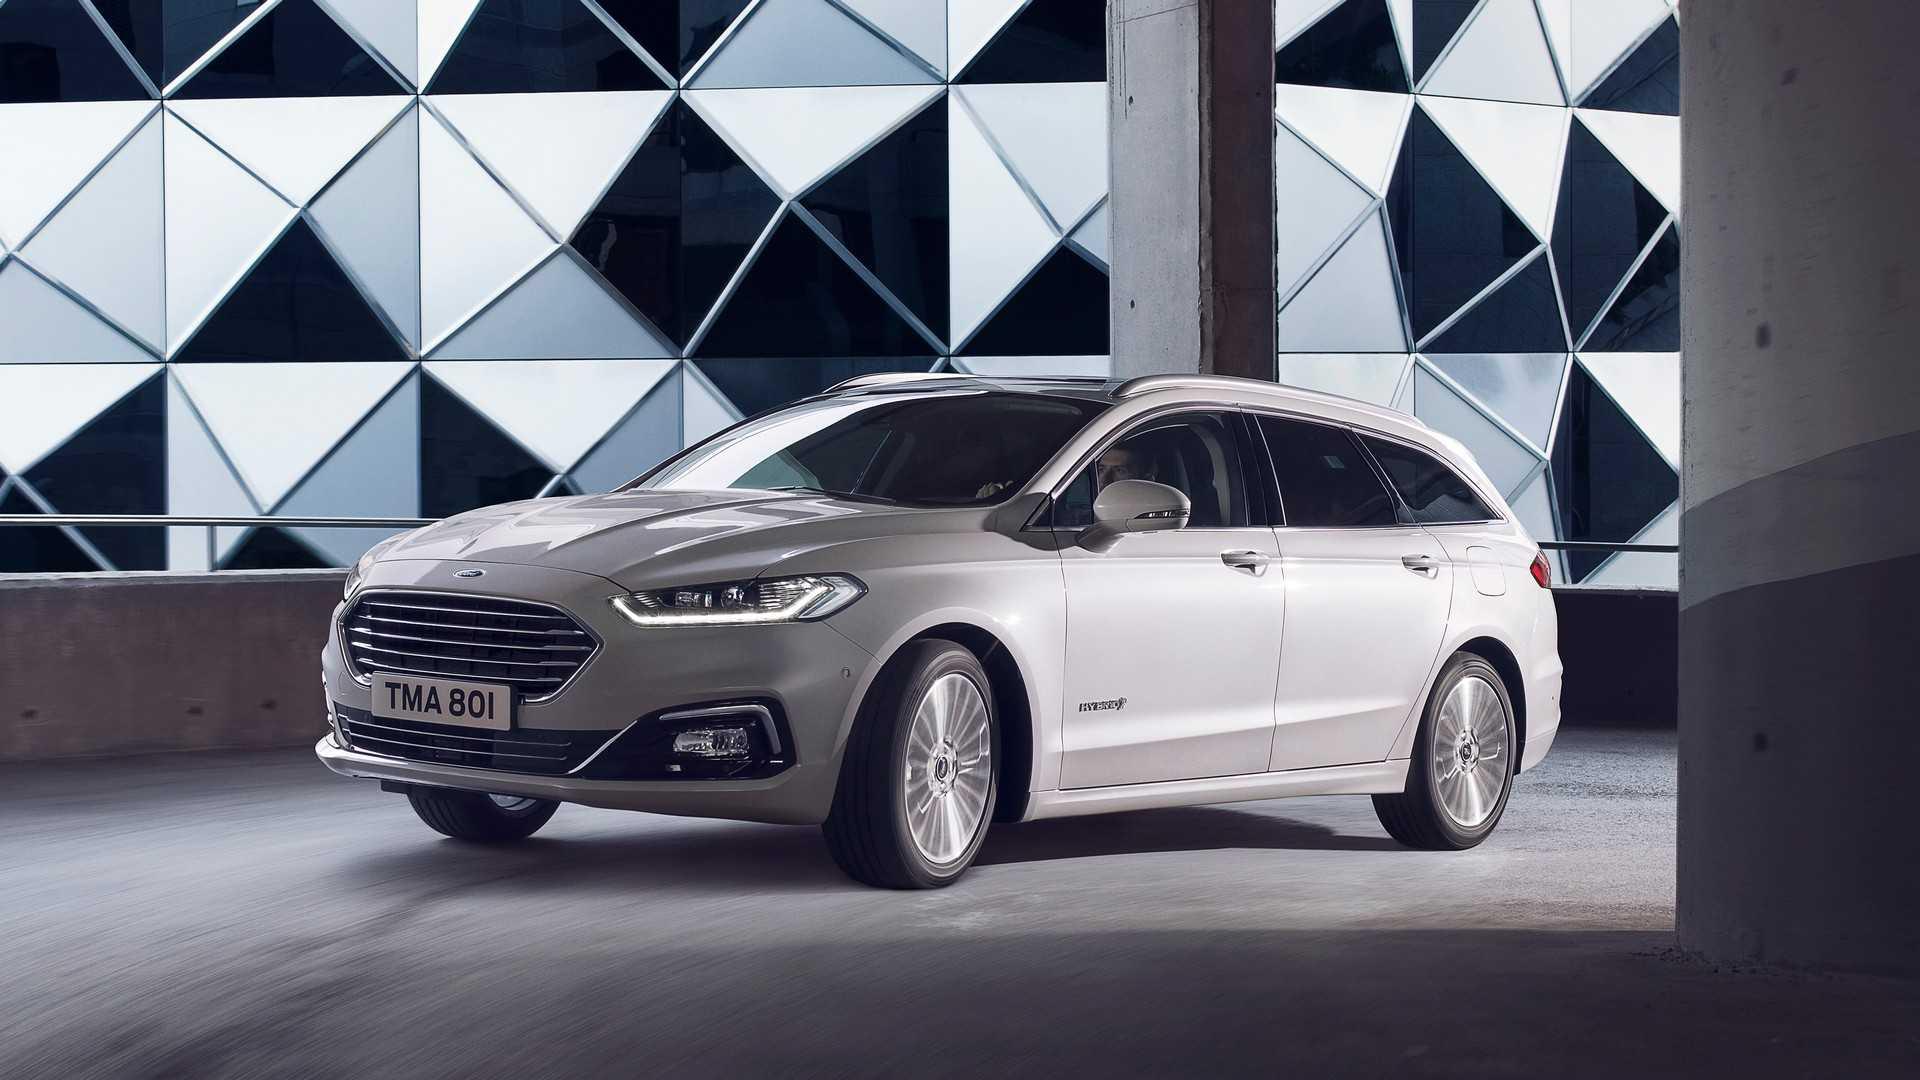 Новый Форд Мондео 2019: обзор, характеристики